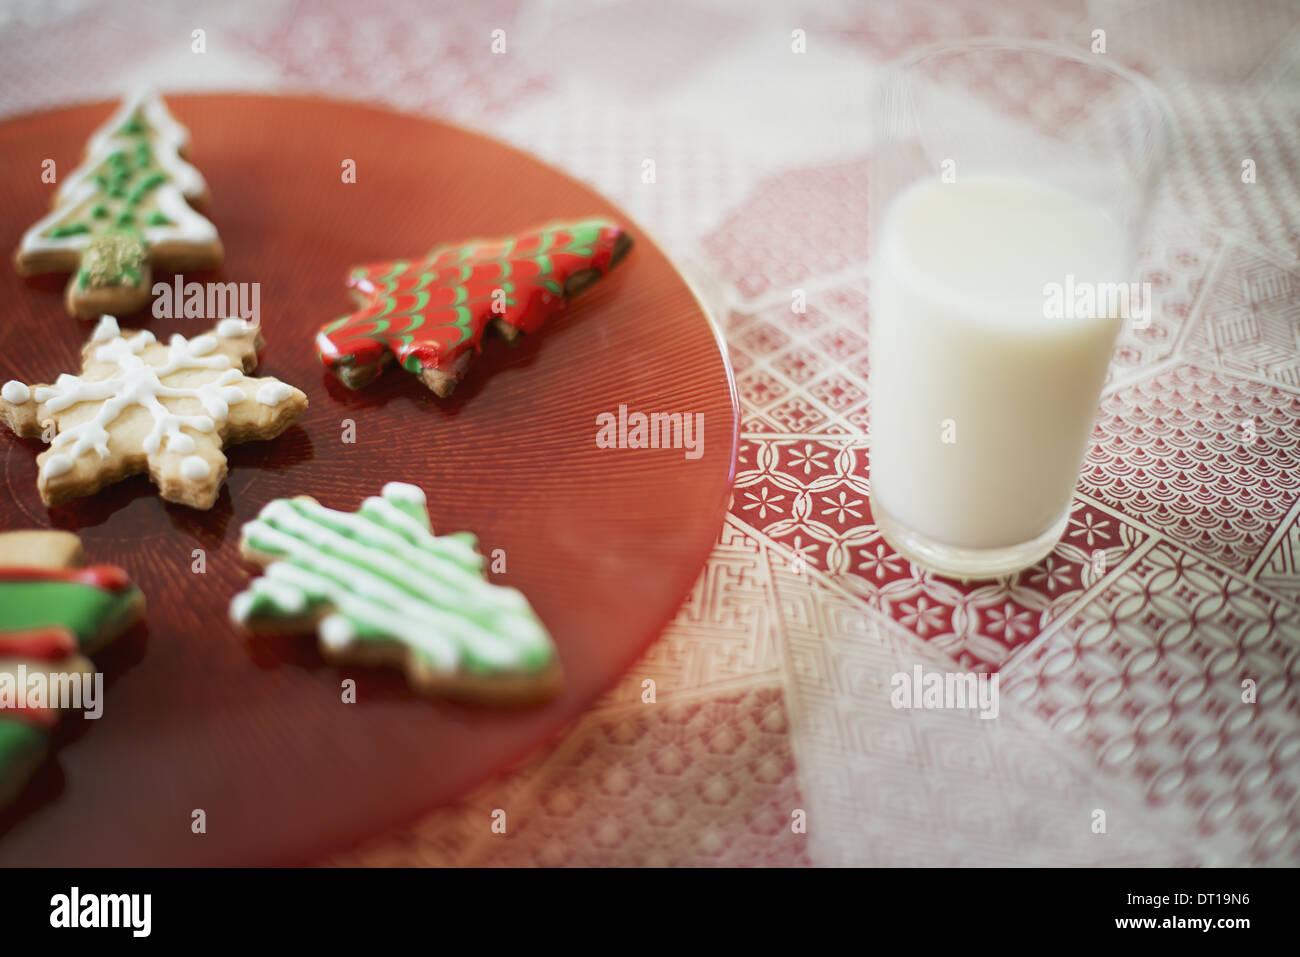 Woodstock New York STATI UNITI D'AMERICA in casa organico biscotti di Natale un bicchiere di latte Immagini Stock